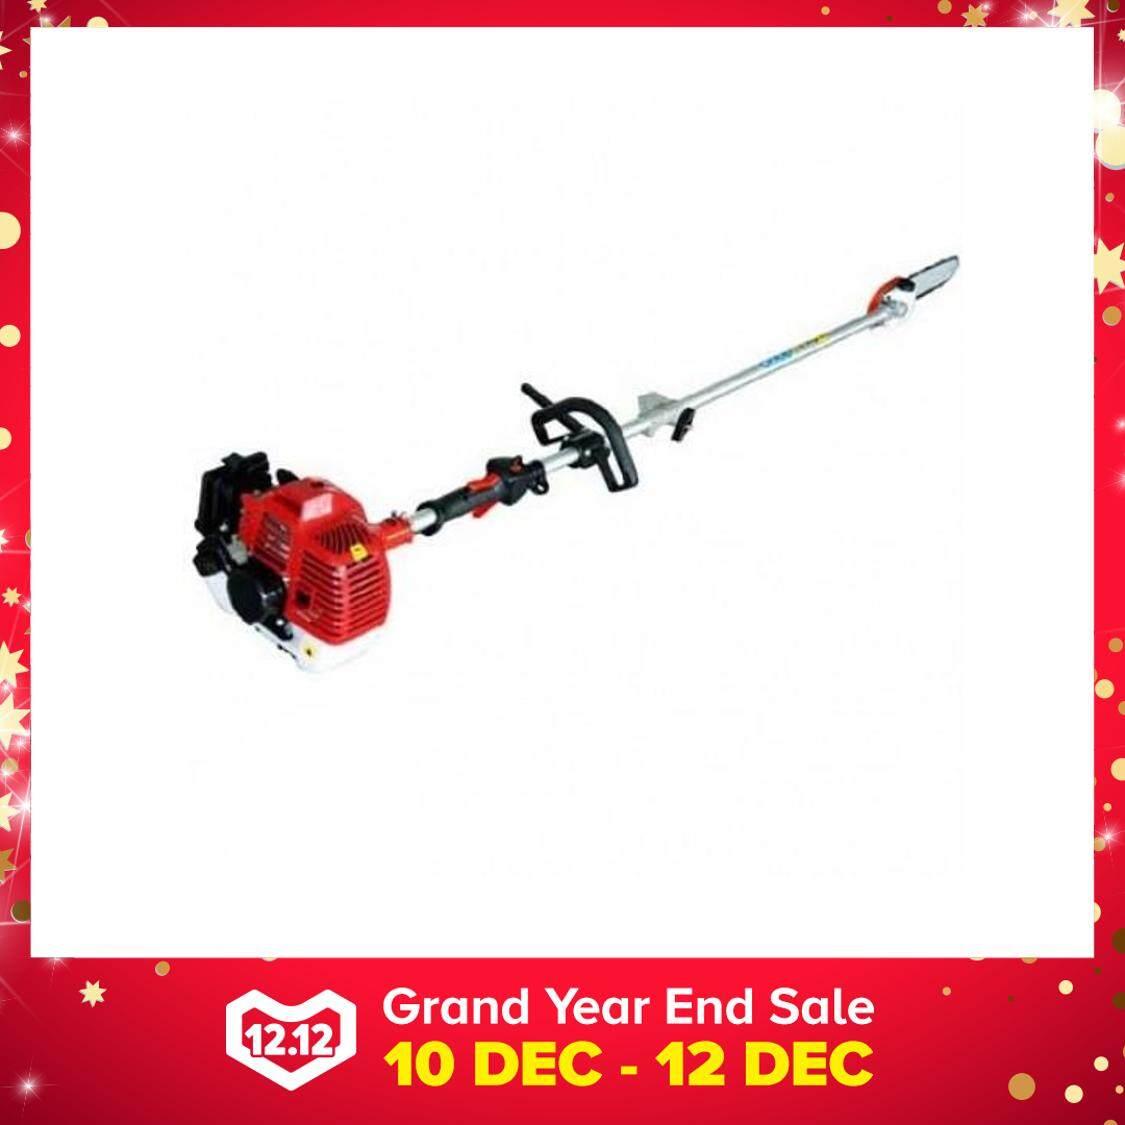 2 Stroke Petrol Pole Saw / Branch Cutter / Chain Saw 32CC 12 GUIDE BAR